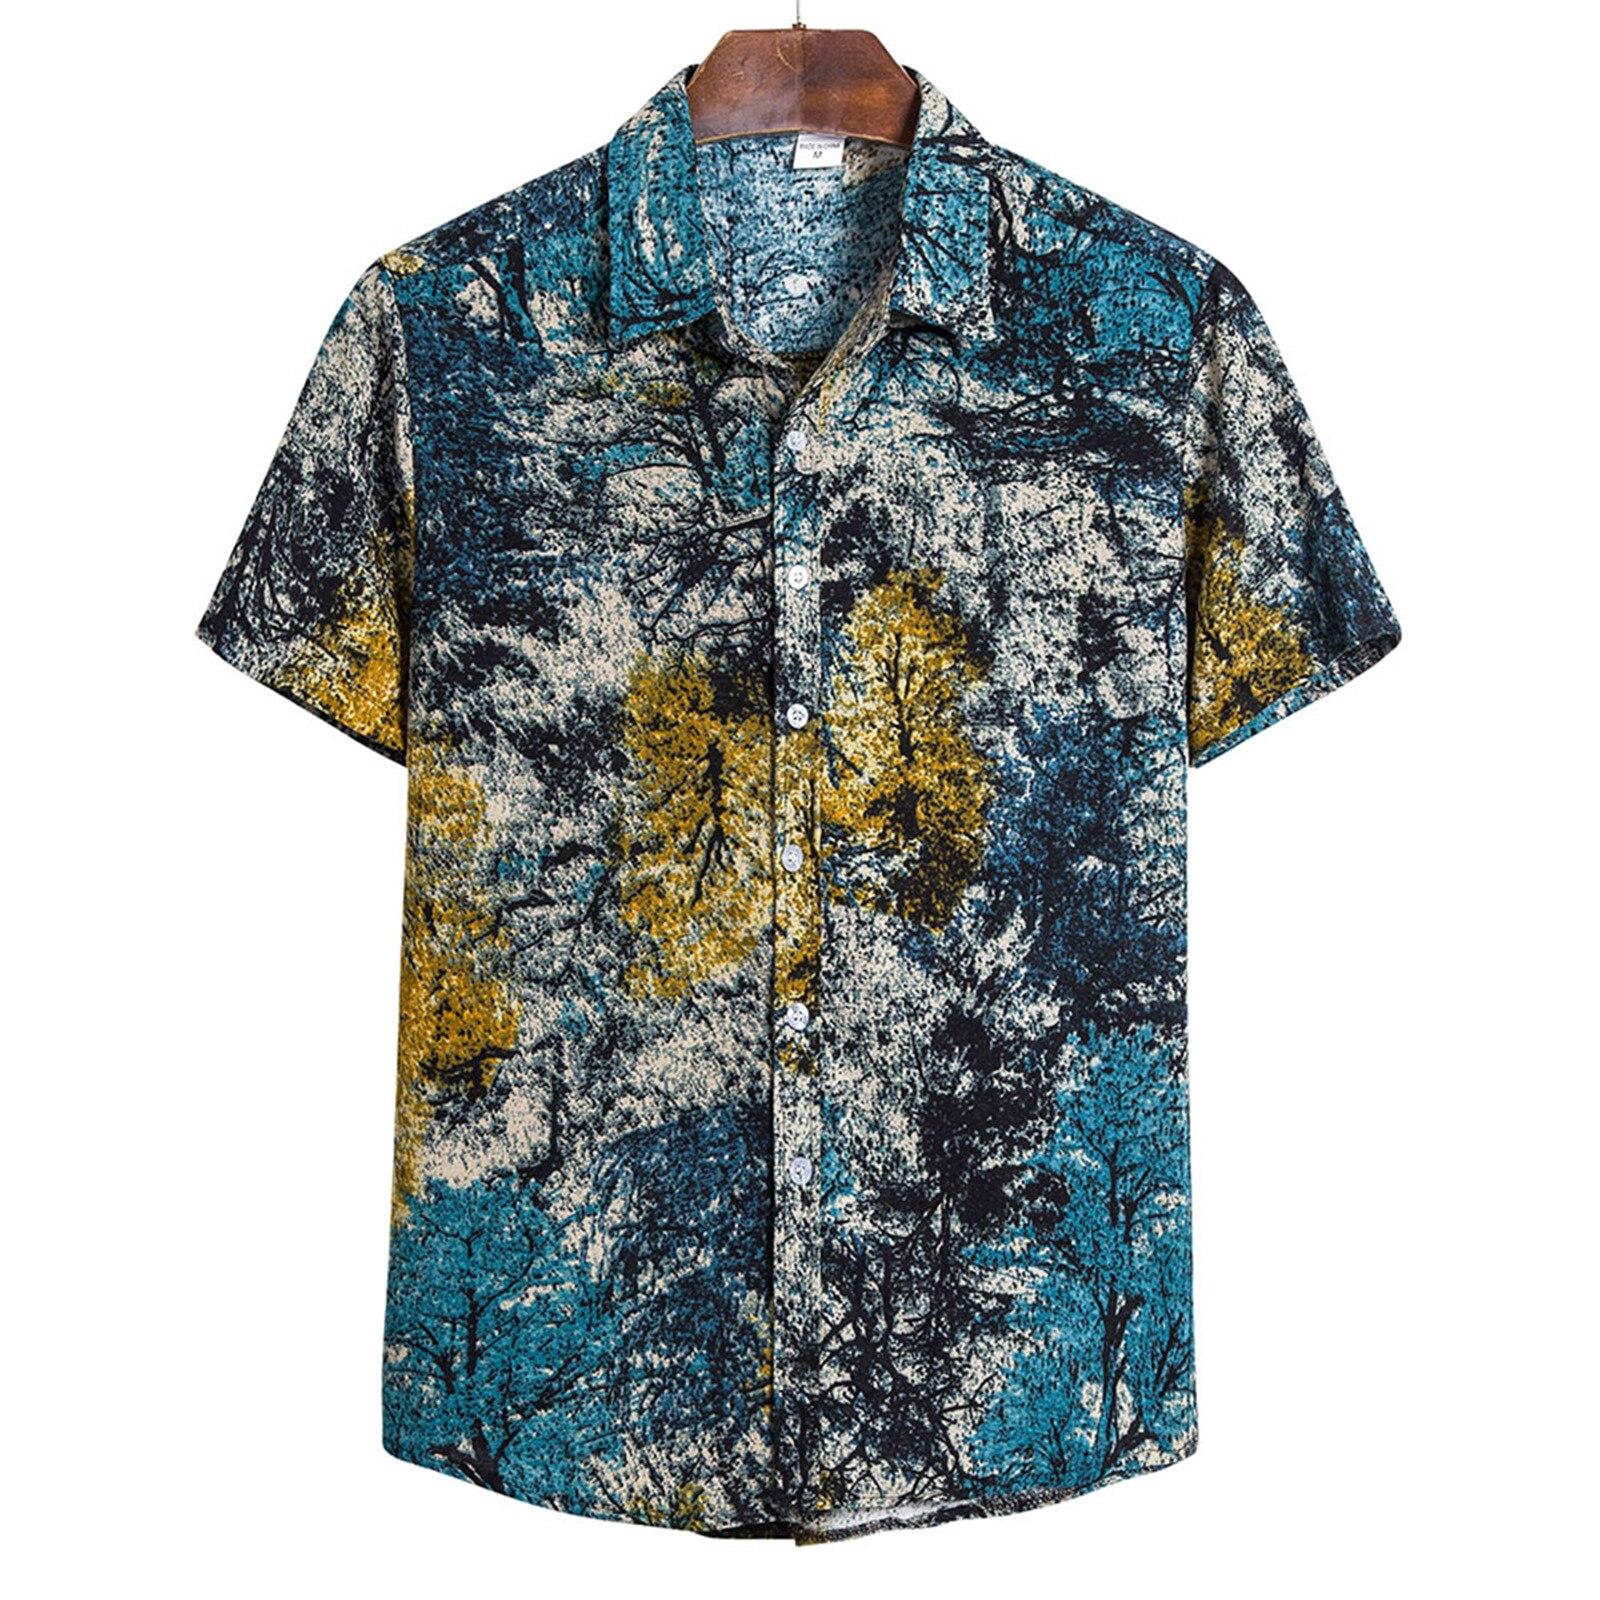 Mens Casual Shirt Vintage Print Short Sleeve Hawaiian Shirts Blouse Men Clothing Streetwear For Ropa Hombre